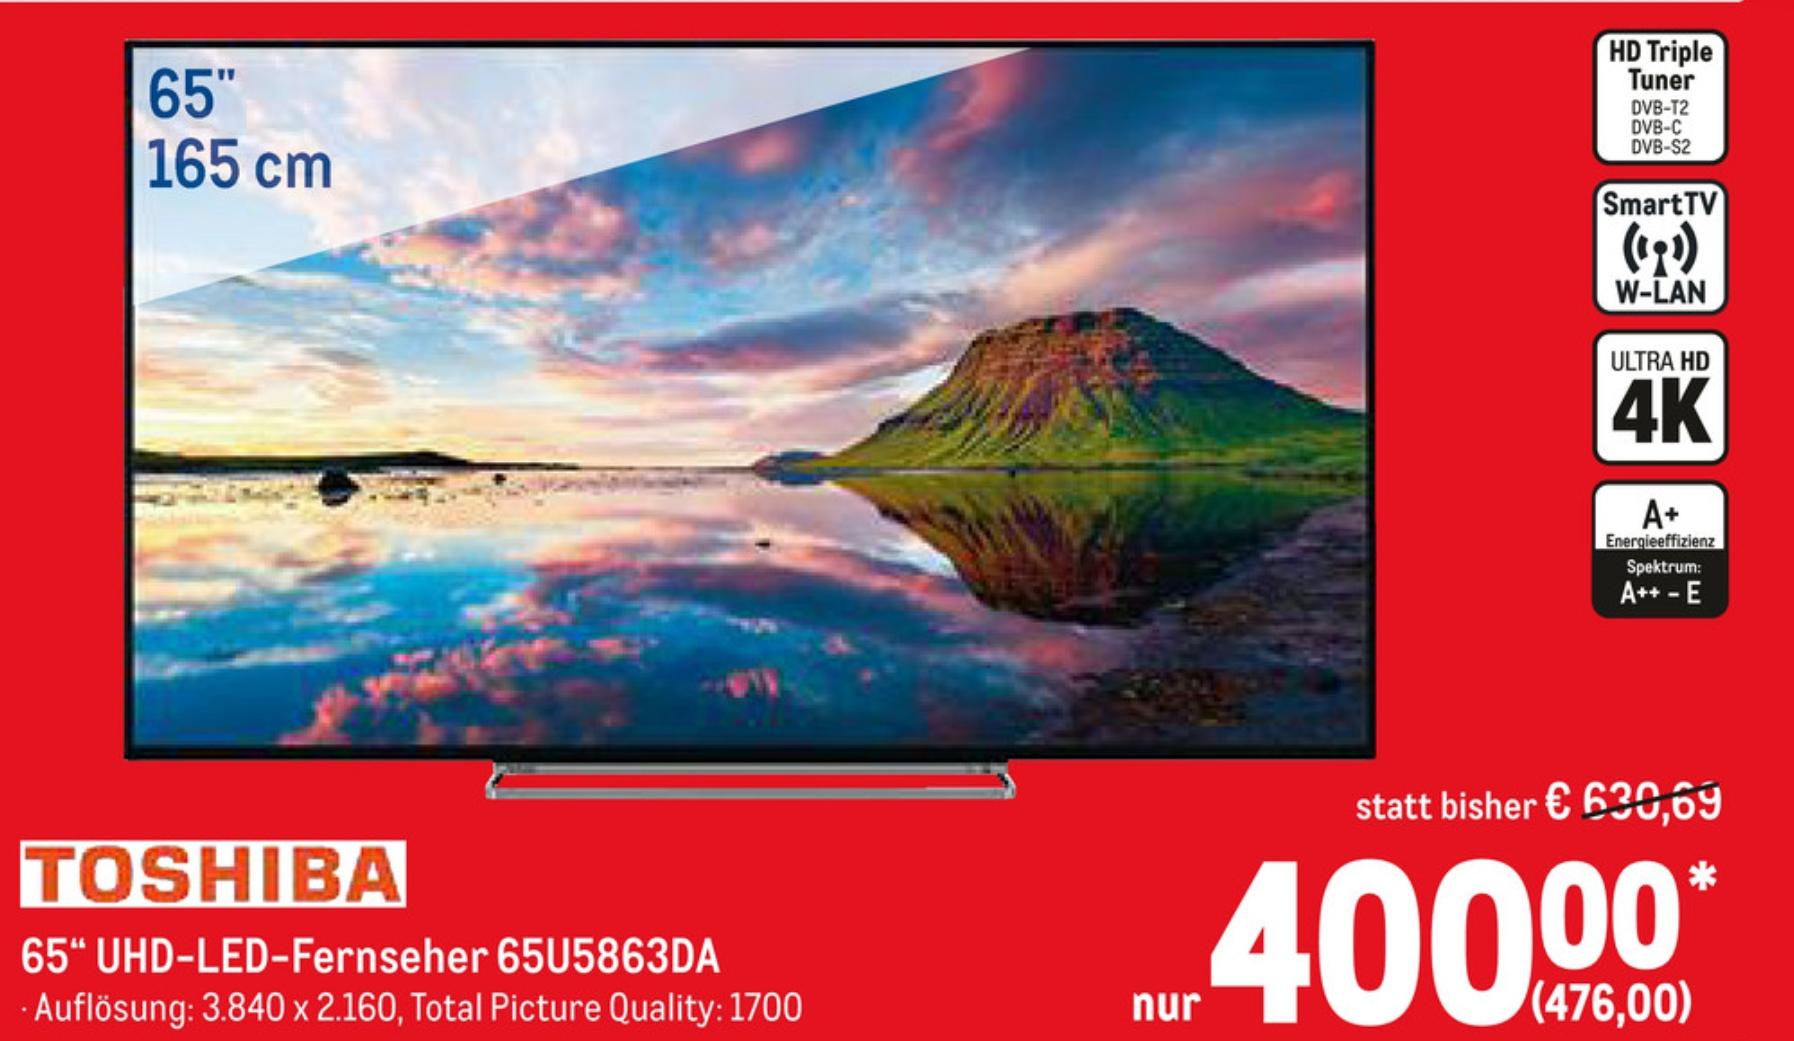 (Lokal Metro) Toshiba 165 cm/65 Zoll 4K Ultra HD 65U5863DA LED-Fernseher mit Lautsprecher von Onkyo (Smart-TV, Dolby Vision HDR, HDR10, HLG)